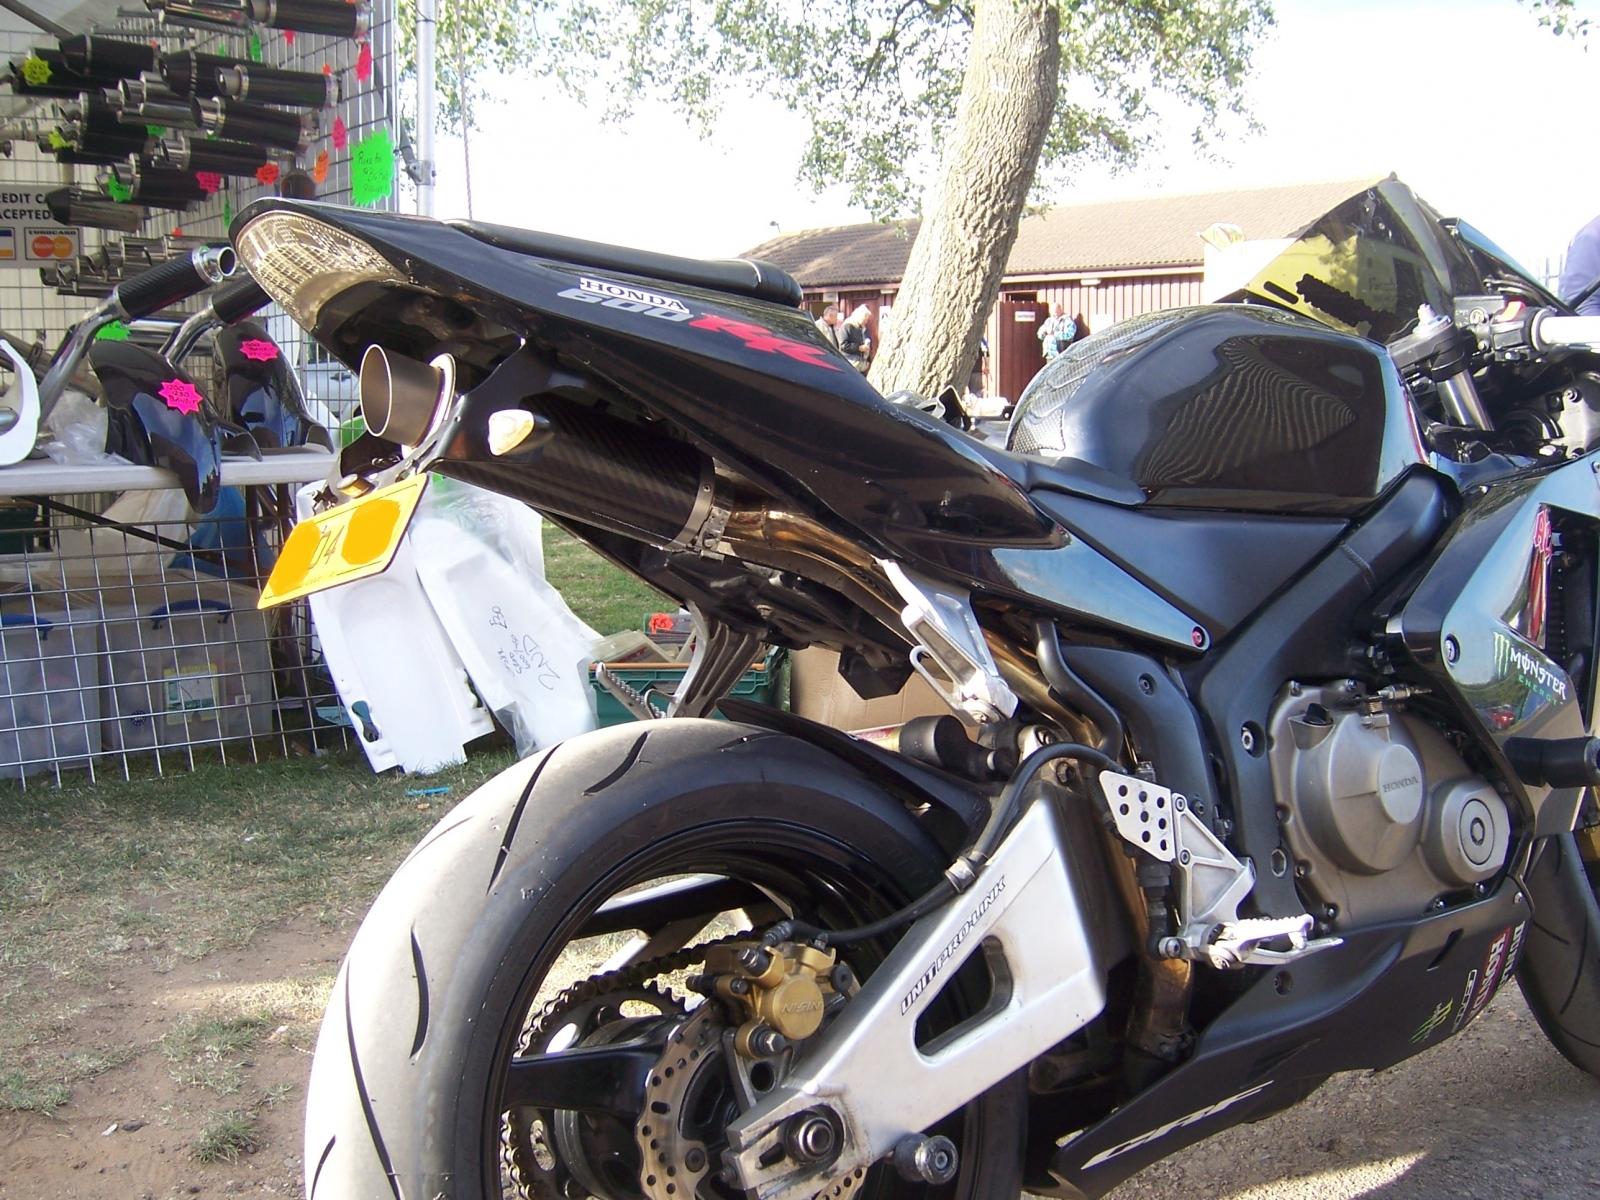 "Honda CBR600RR 2004<p>A16 Moto GP Carbon Exhaust with Titanium Type Slashcut Outlet</p><br/><br/><a href=""https://a16roadnracesupplies.co.uk/product/a16-honda-exhausts/"">Buy now!</a>"